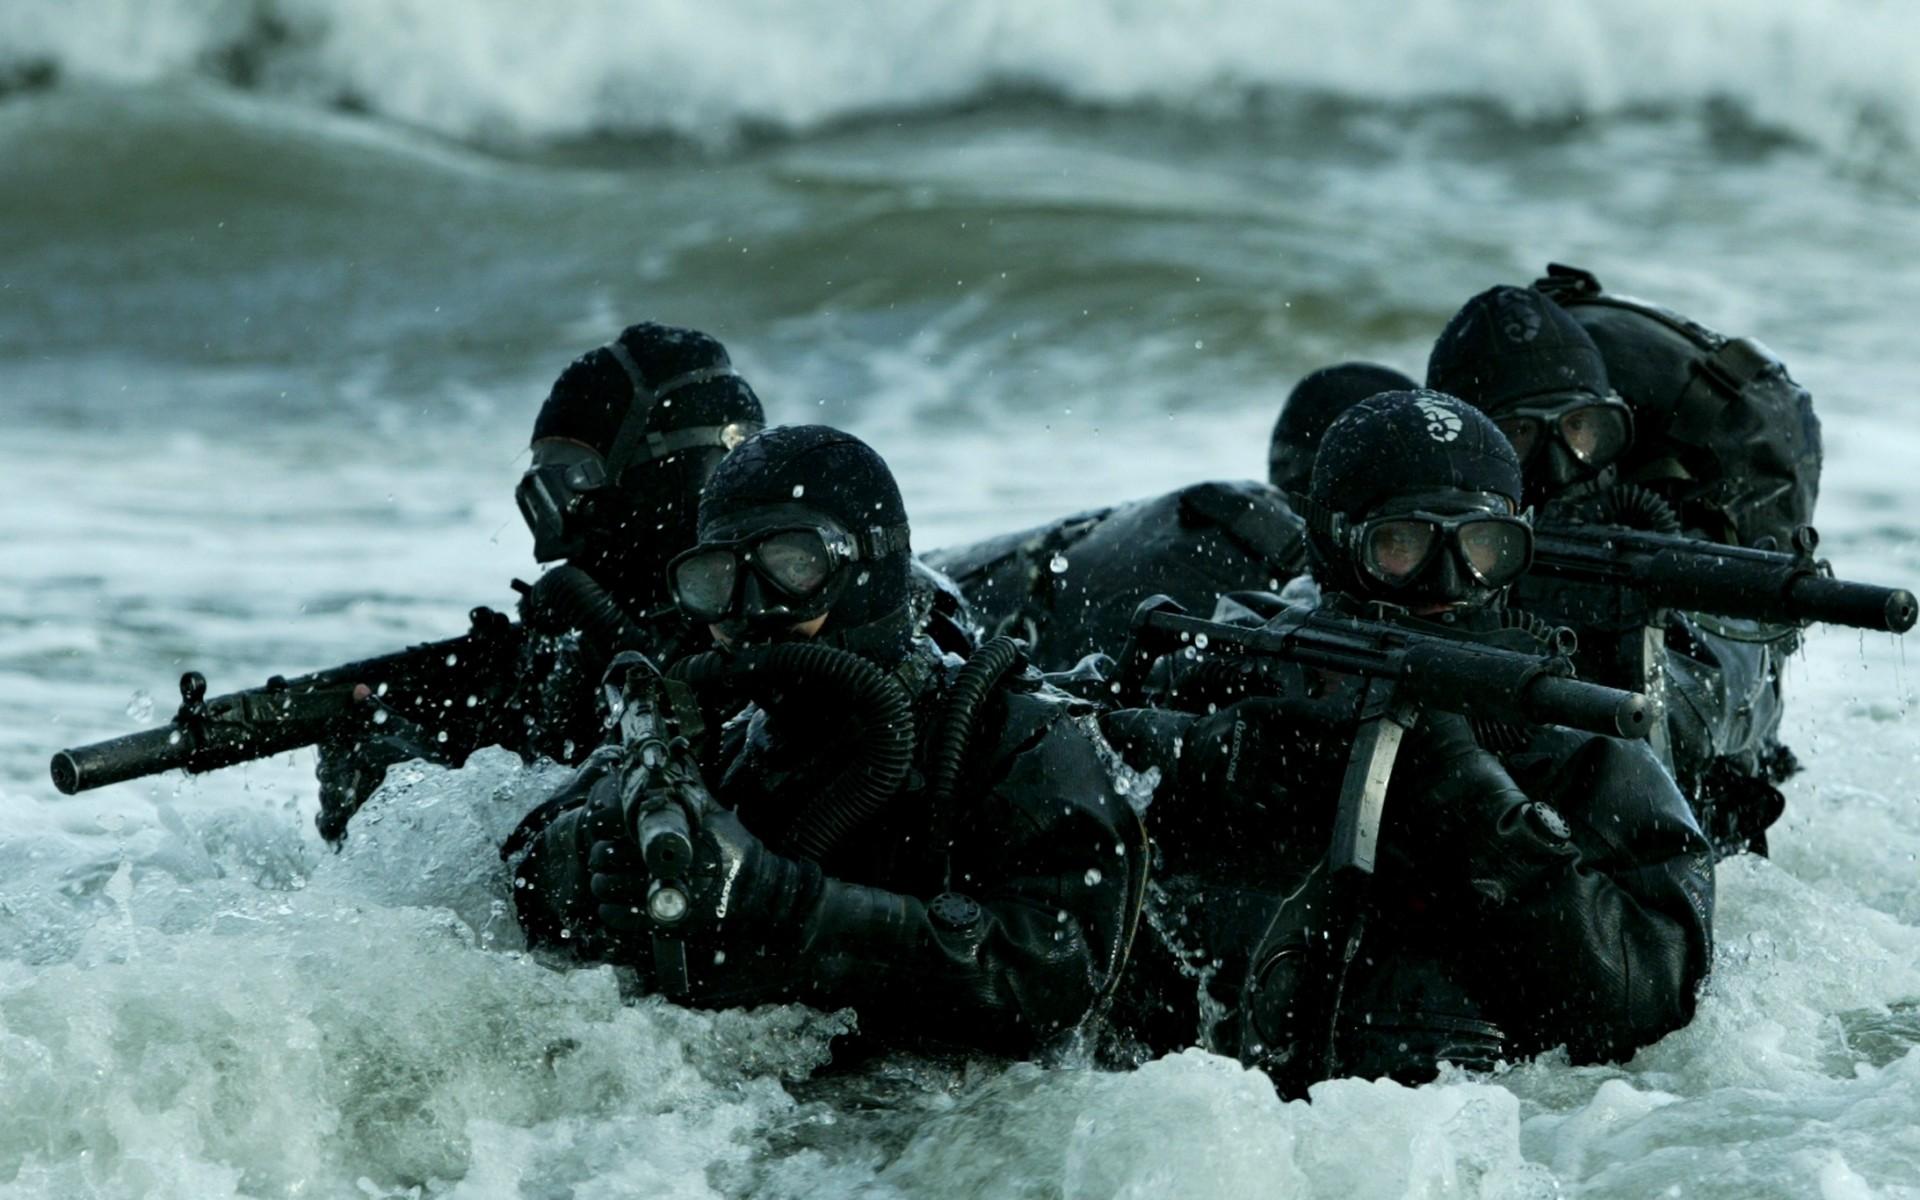 Army Military Navy Seals HD Wallpaper 8605